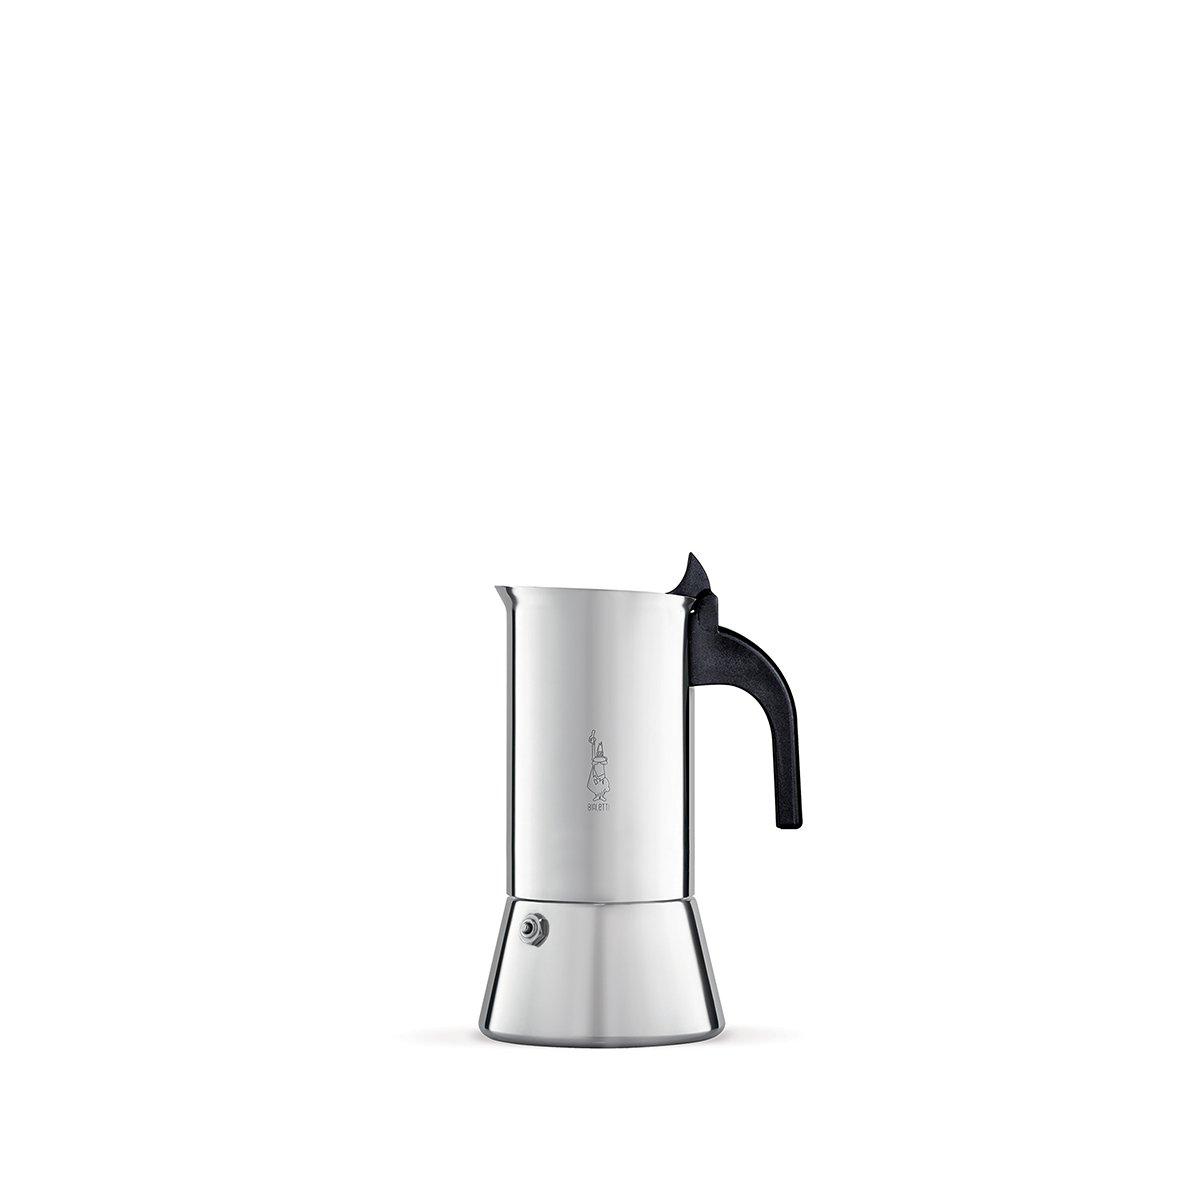 Bialetti Venus 2 (Italian Espresso Size Cups) Stainless Steel Espresso Maker by Bialetti